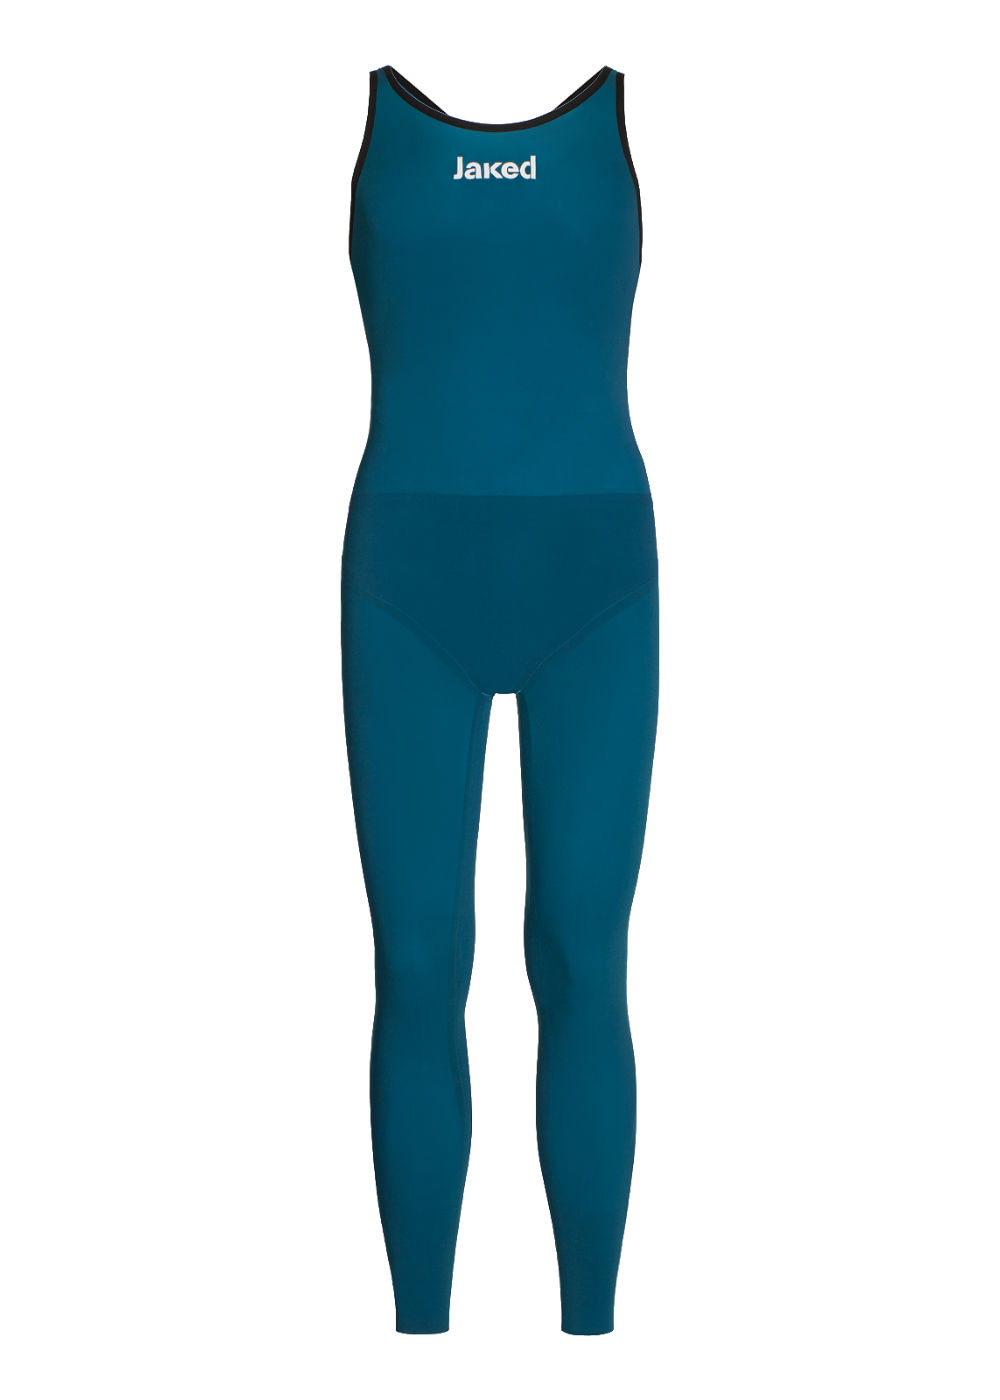 319f7d862ee8 Costumi acque libere : Costume OW Jkatana FML uomo